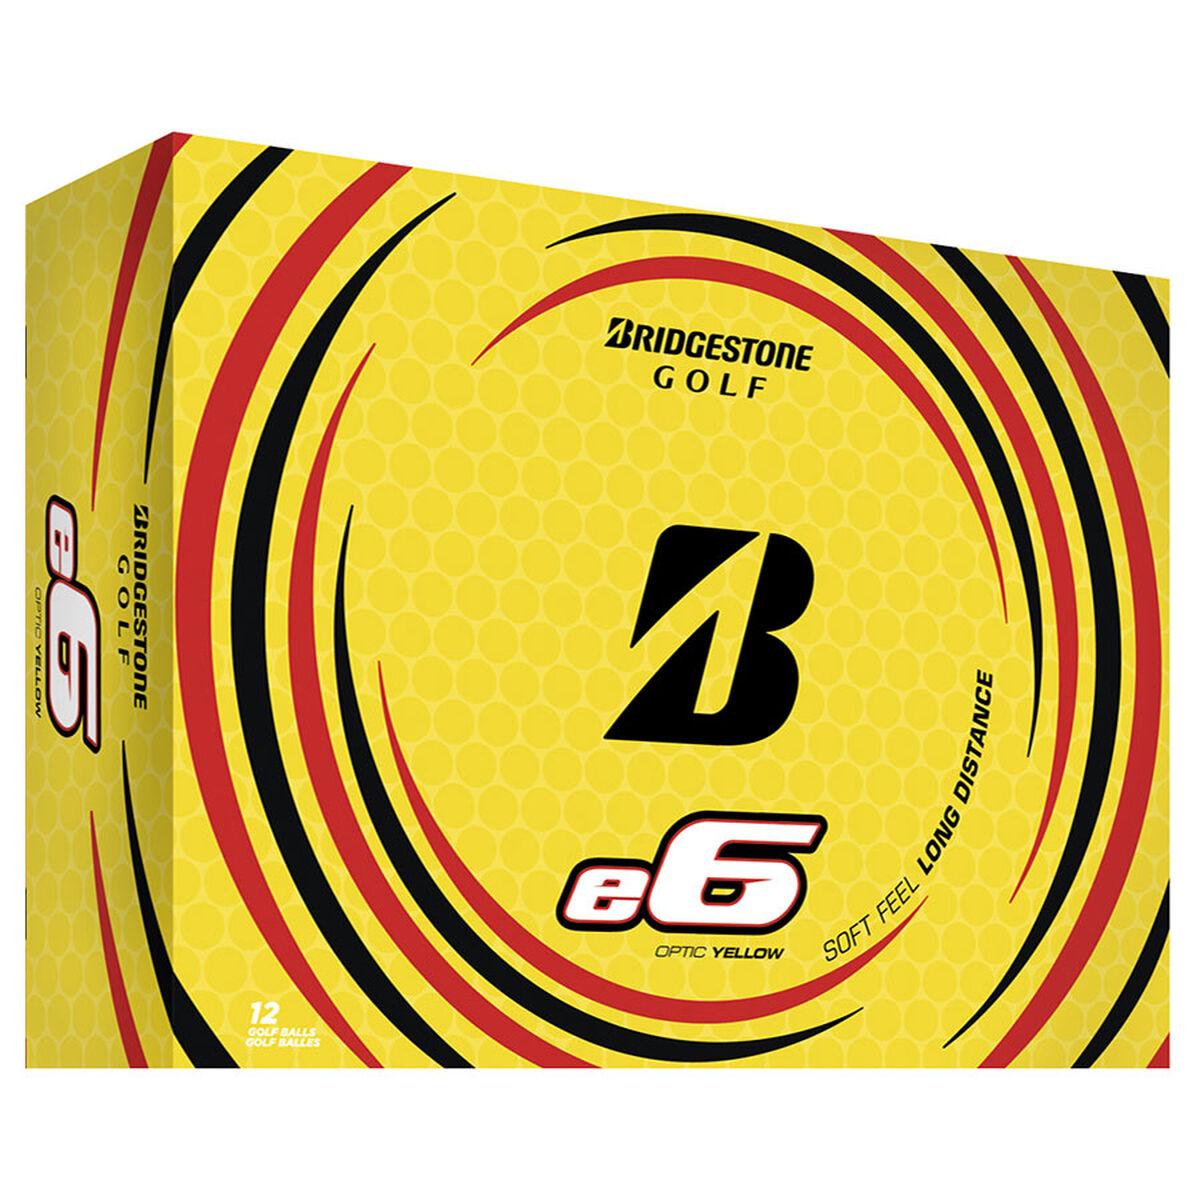 Bridgestone Golf e6 12 Ball Pack, Male, Yellow | American Golf